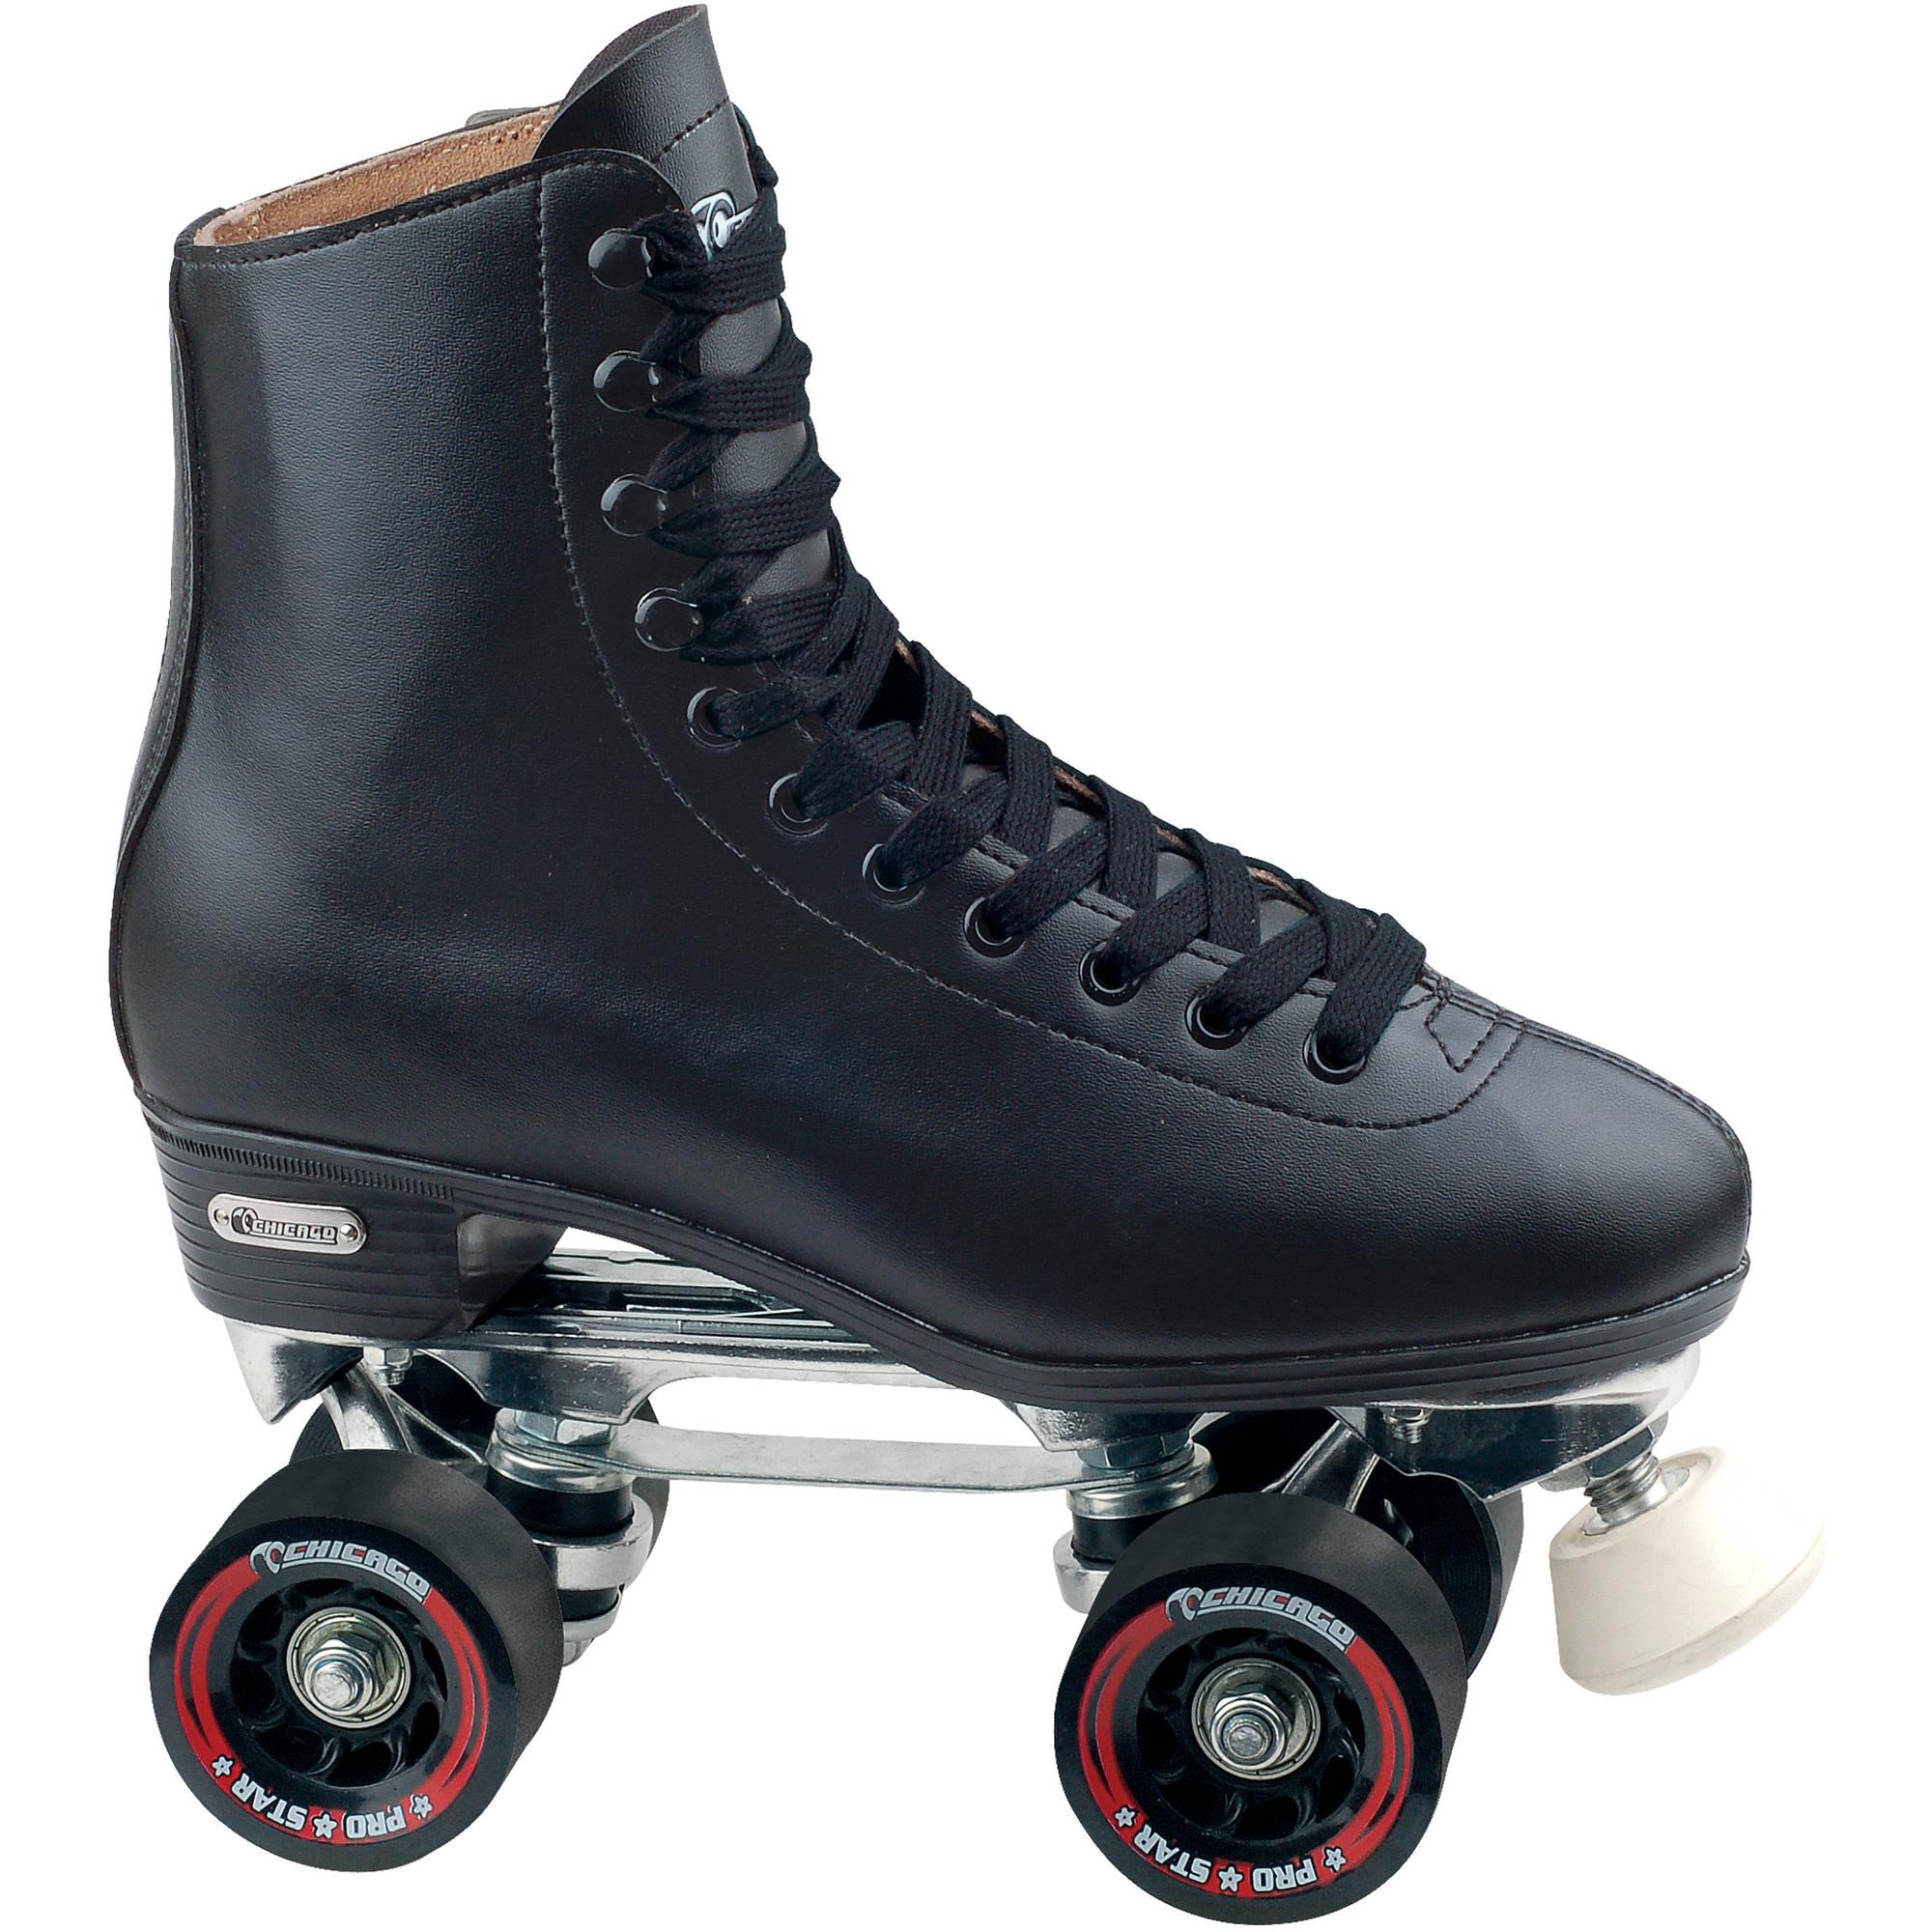 Chicago Leather Lined Men's Rink Skate